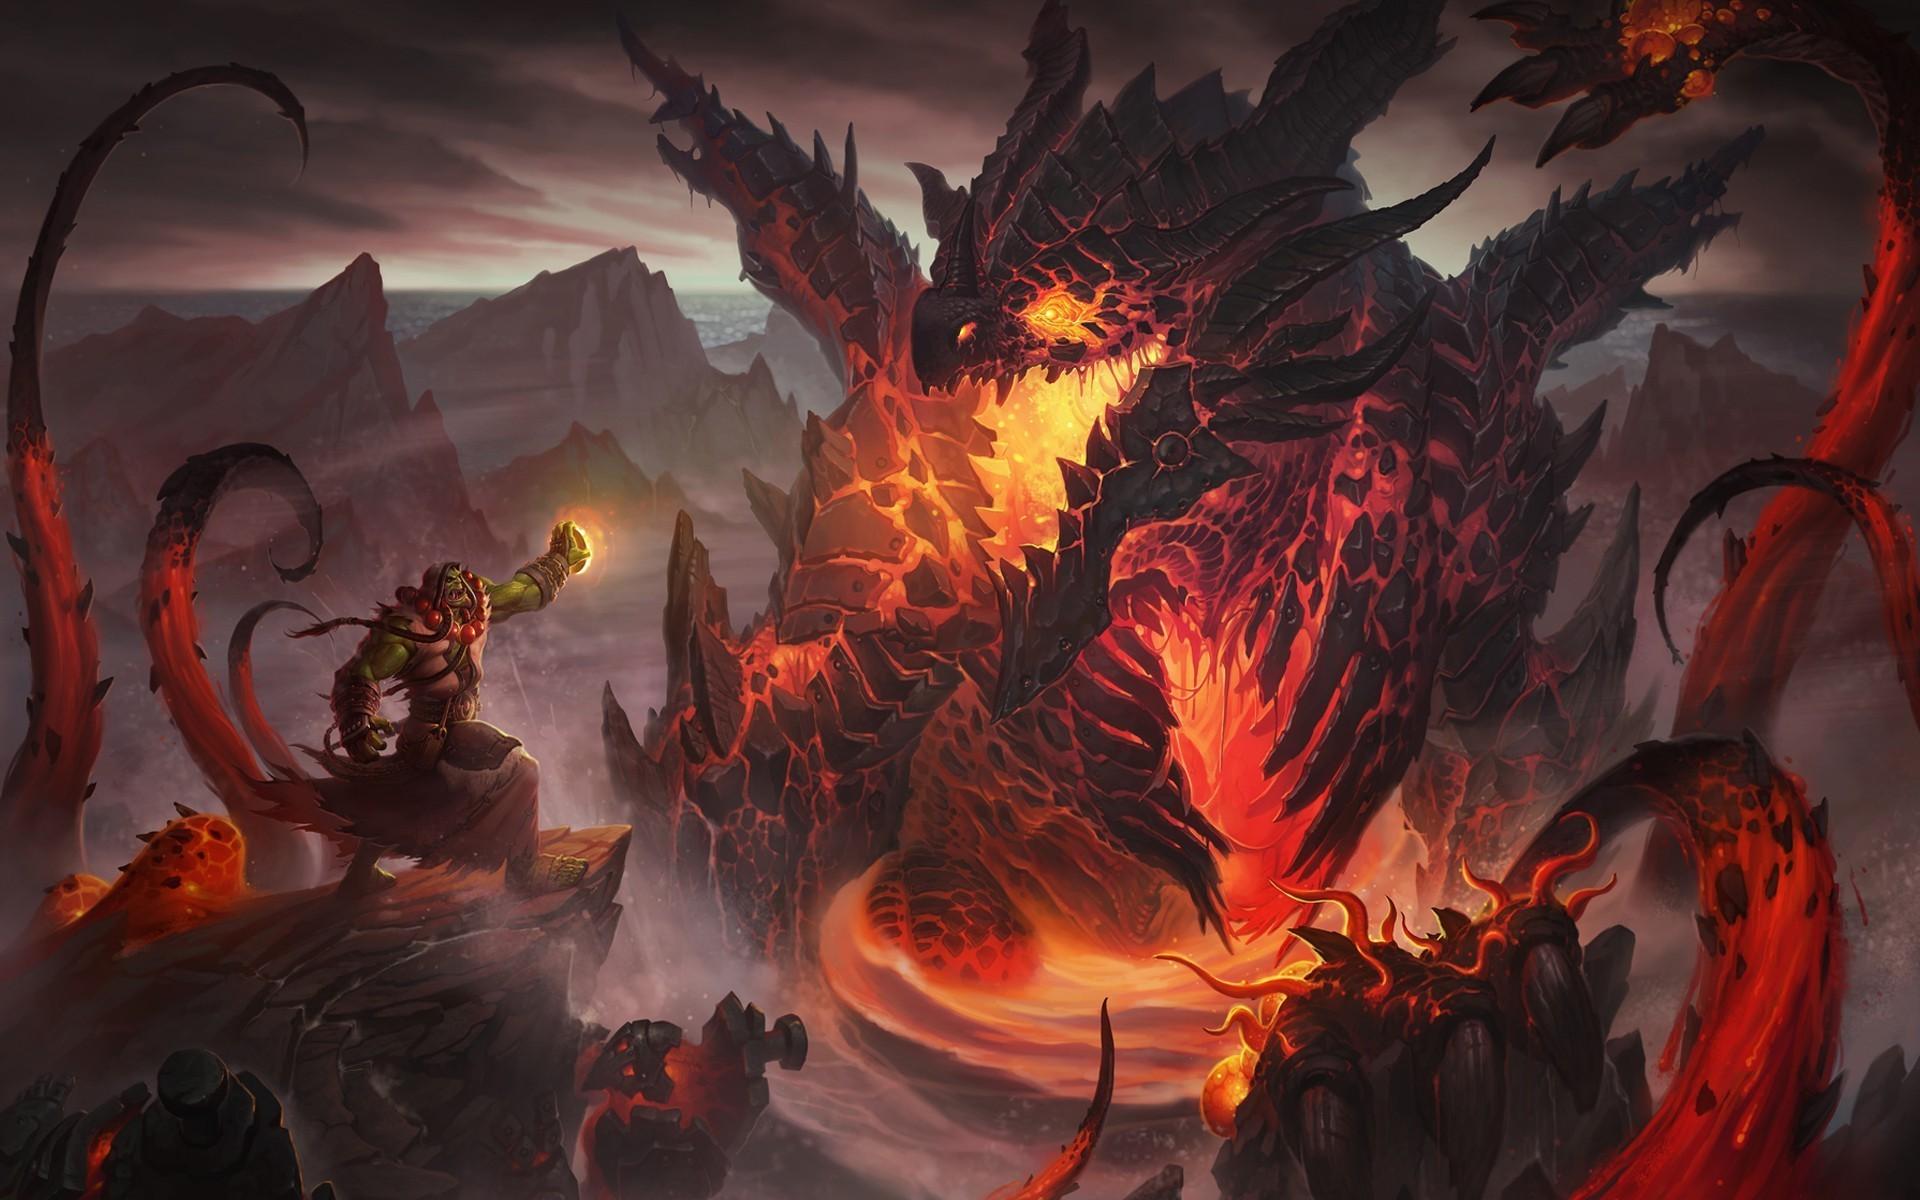 World Of Warcraft Wallpaper HD #6816370